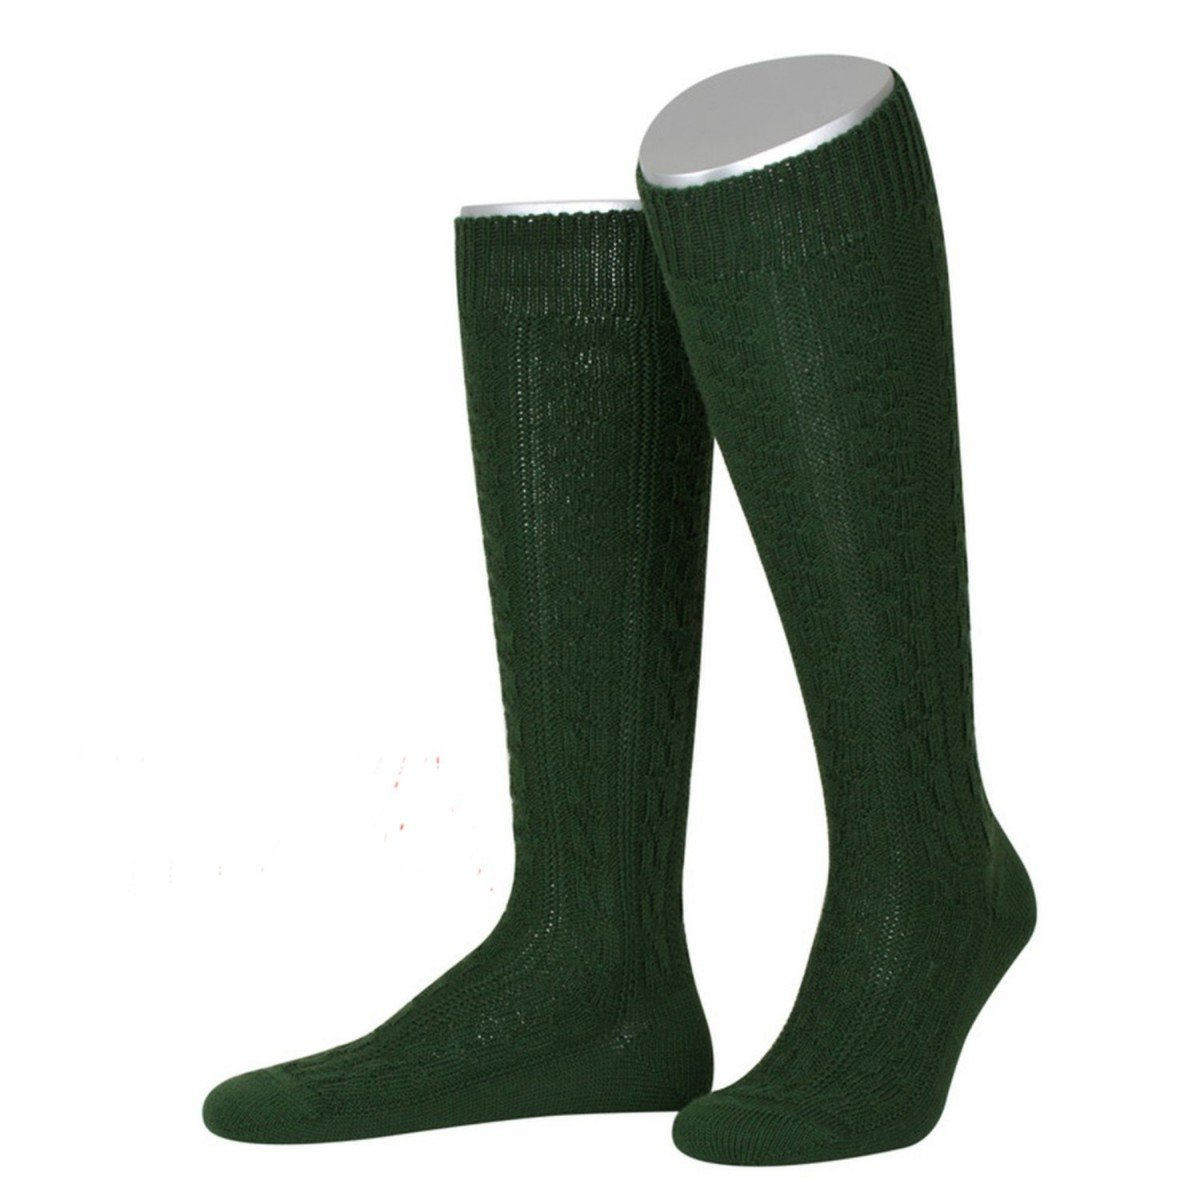 Lusana Herren Trachten-Mode Kniestrümpfe zur Lederhose in Dunkelgrün traditionell Größe:42/43 Farbe:Dunkelgrün 899-844-690